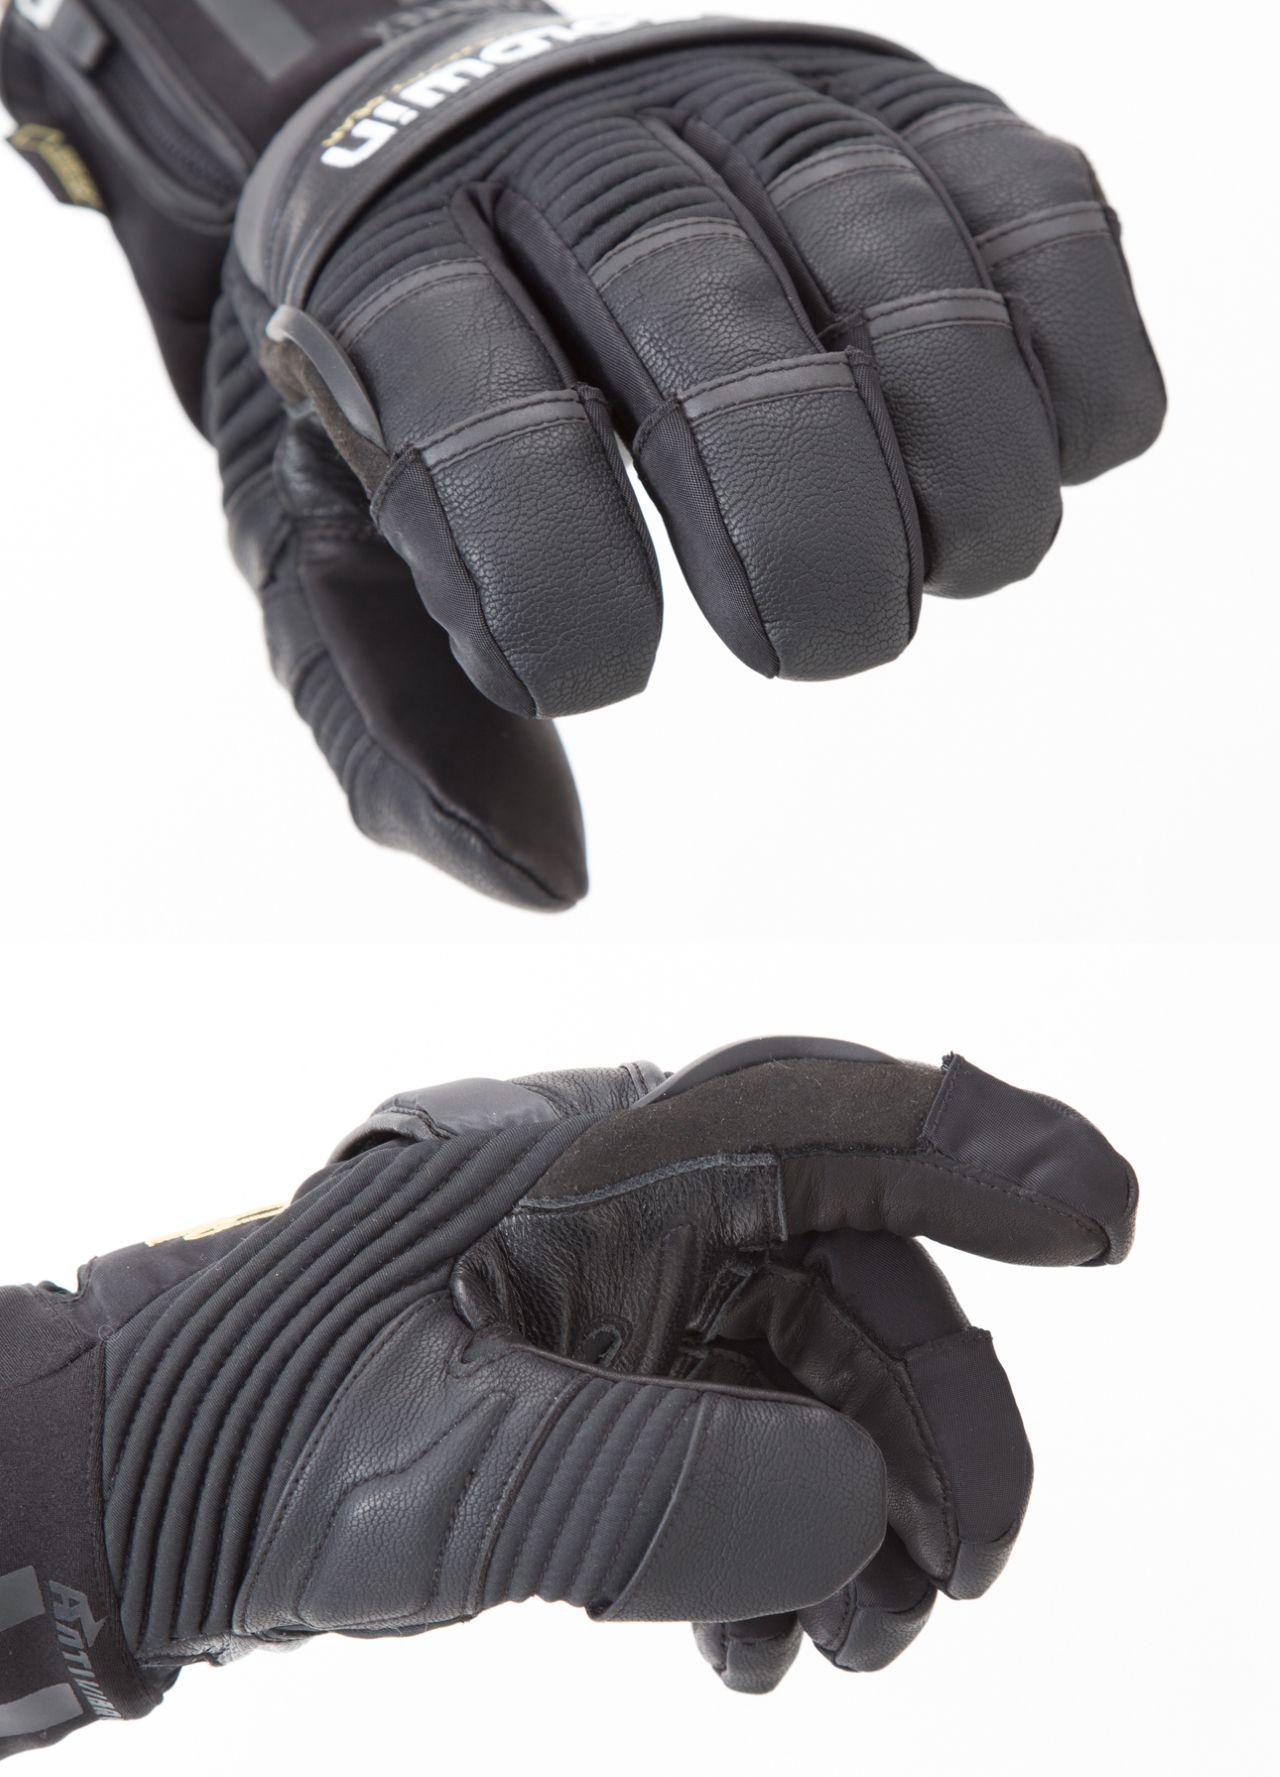 【GOLDWIN】EURO  Gore-Tex多層冬季手套 GSM16550 - 「Webike-摩托百貨」